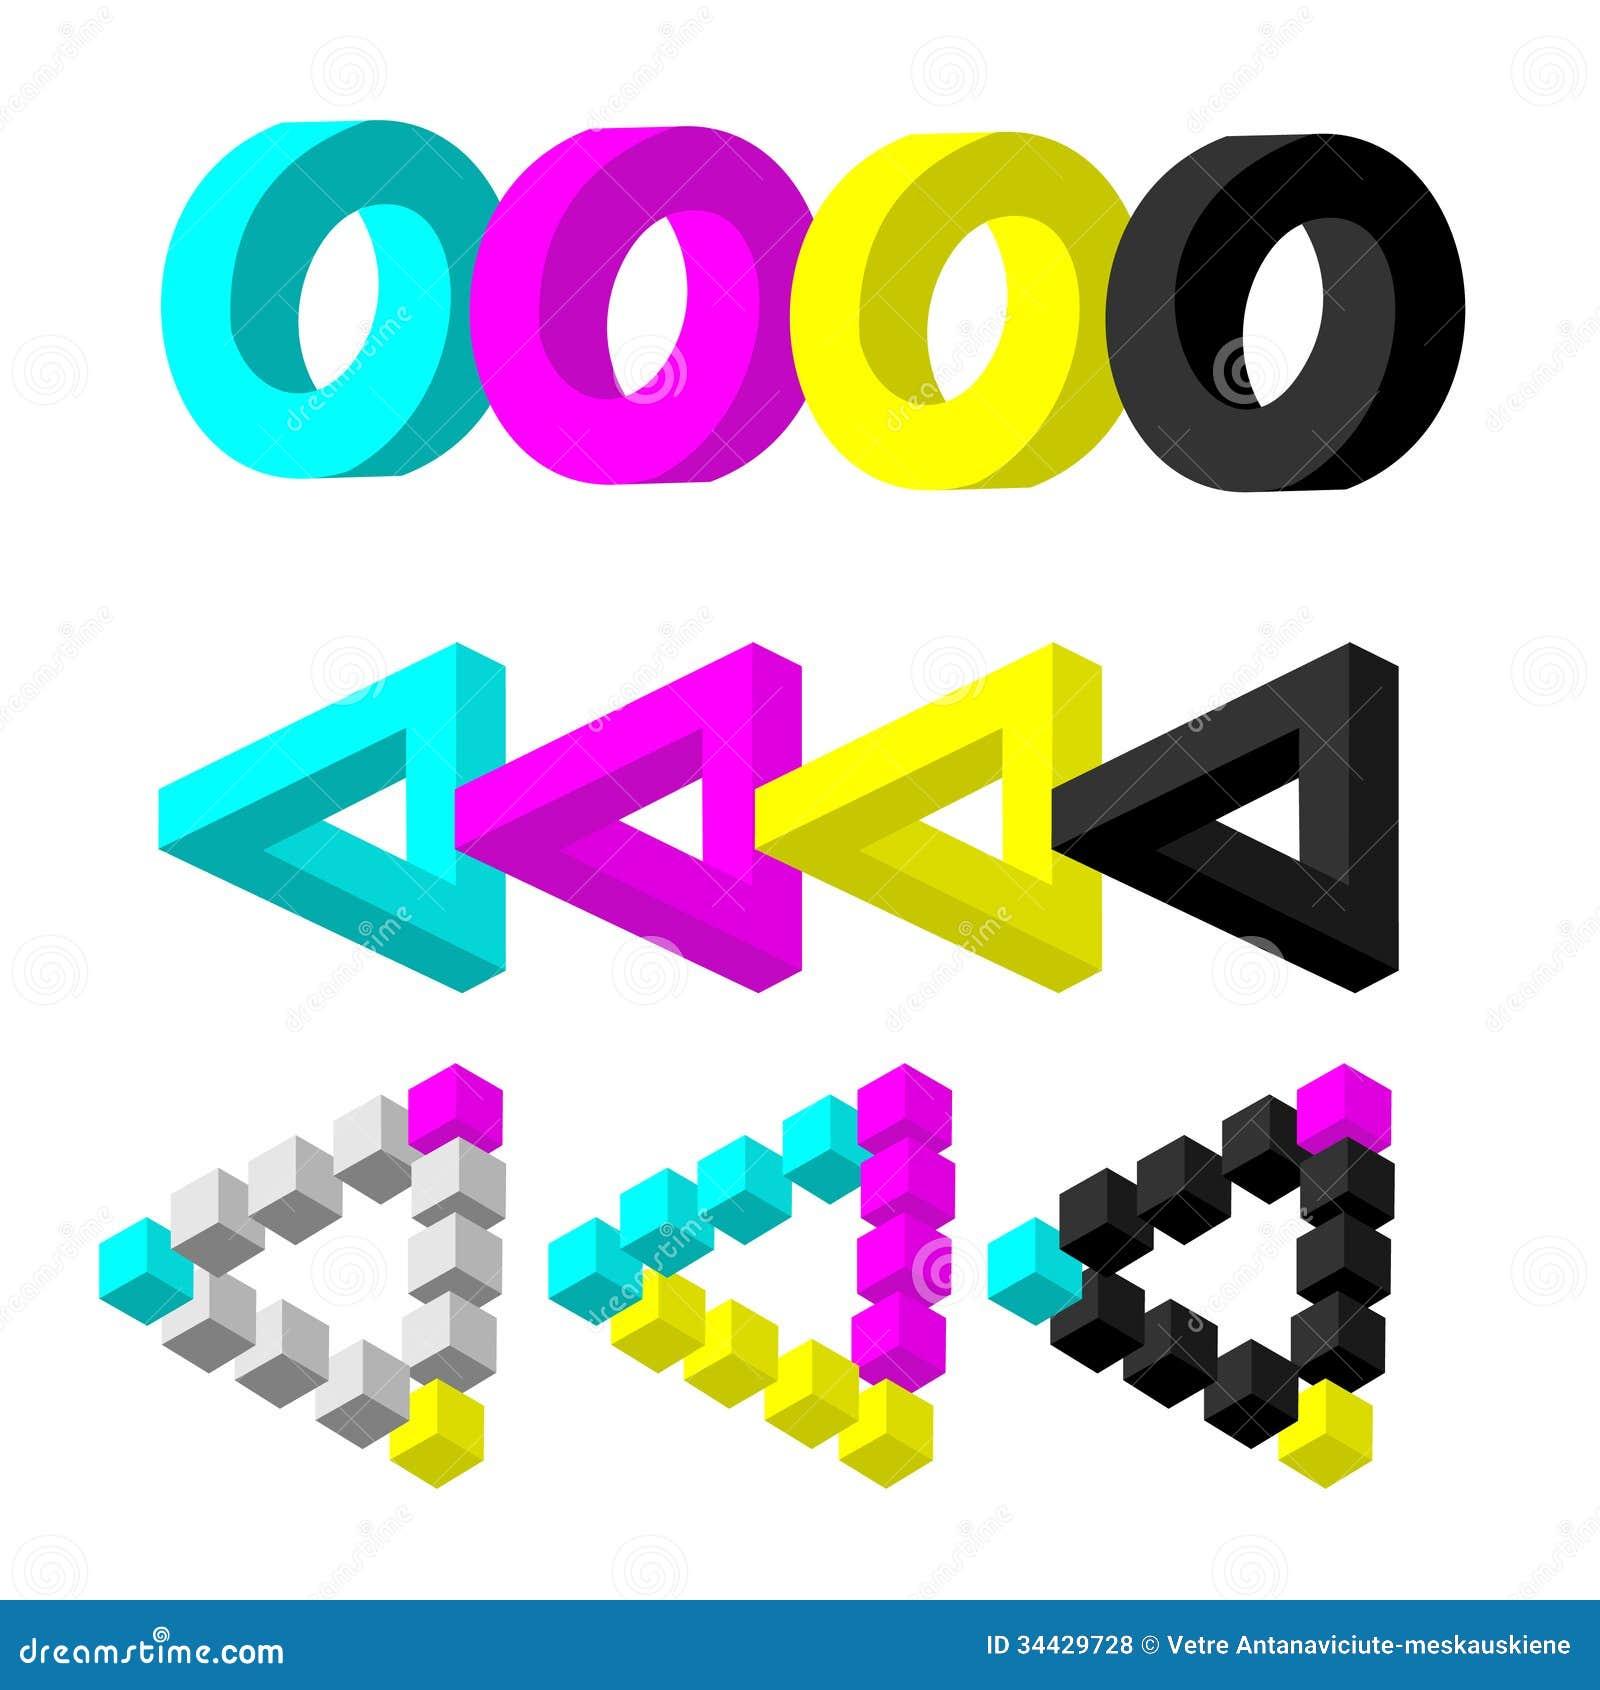 Figuras imposs veis cmyk fotos de stock royalty free - Figuras geometricas imposibles ...